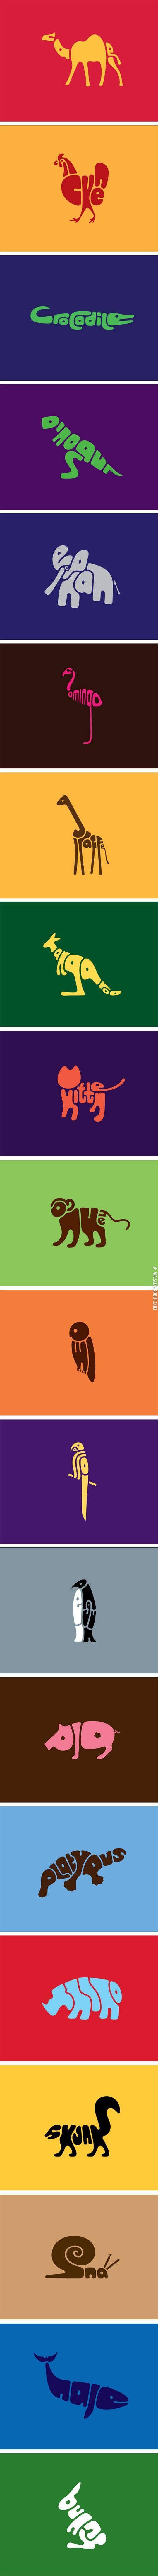 Animals In Words